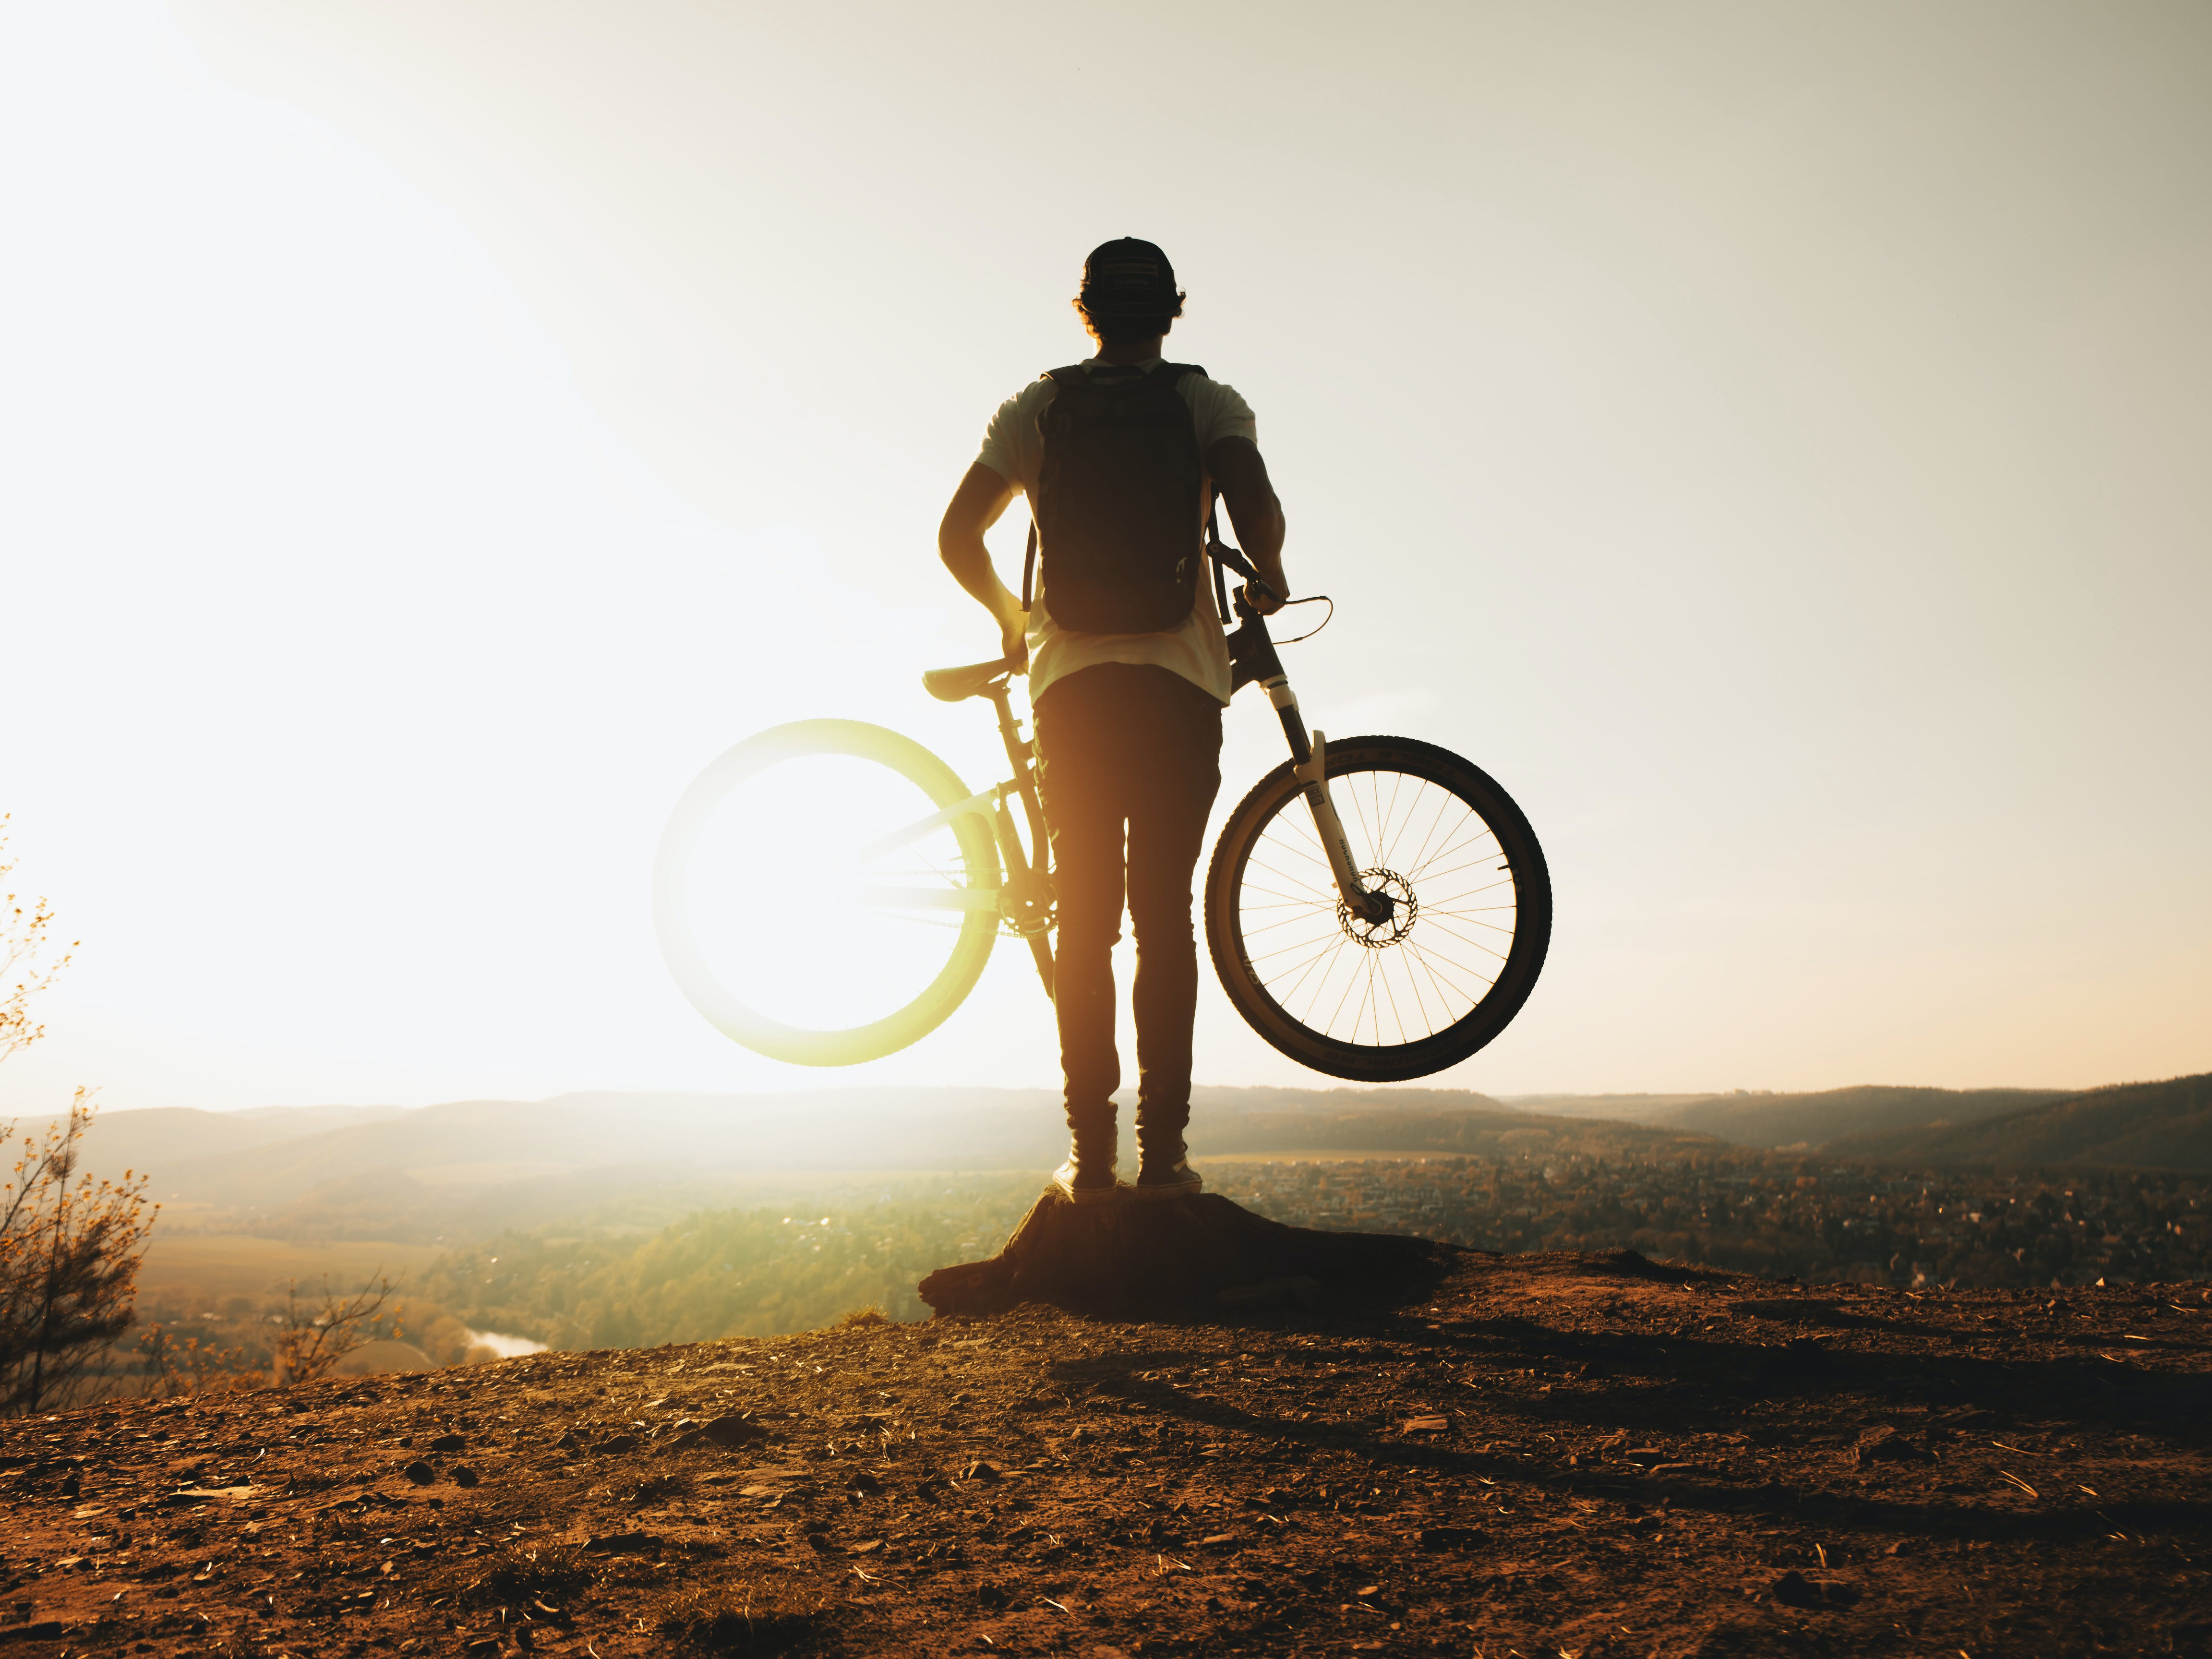 Immagine gratuita di avventura, bicicletta, ciclista, mountain bike